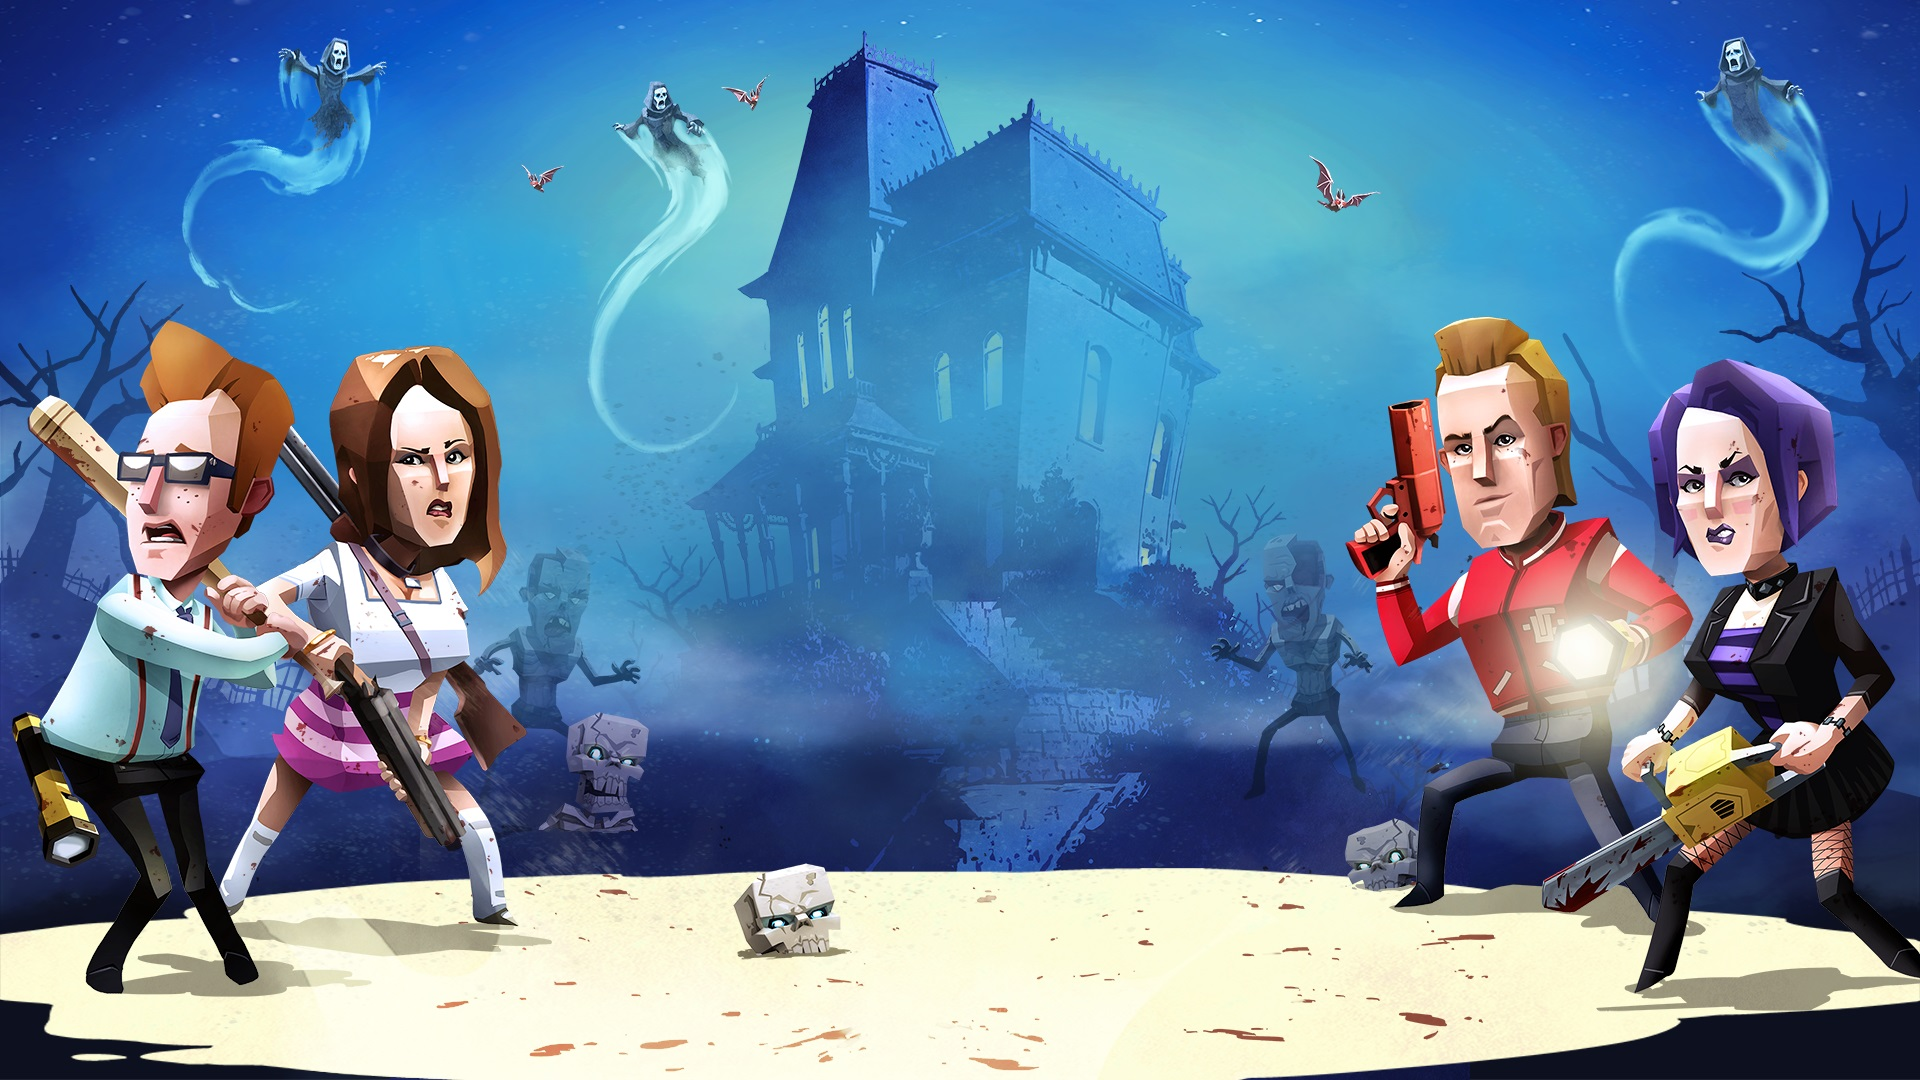 Phantom Halls celebrates B-movie horror this Halloween